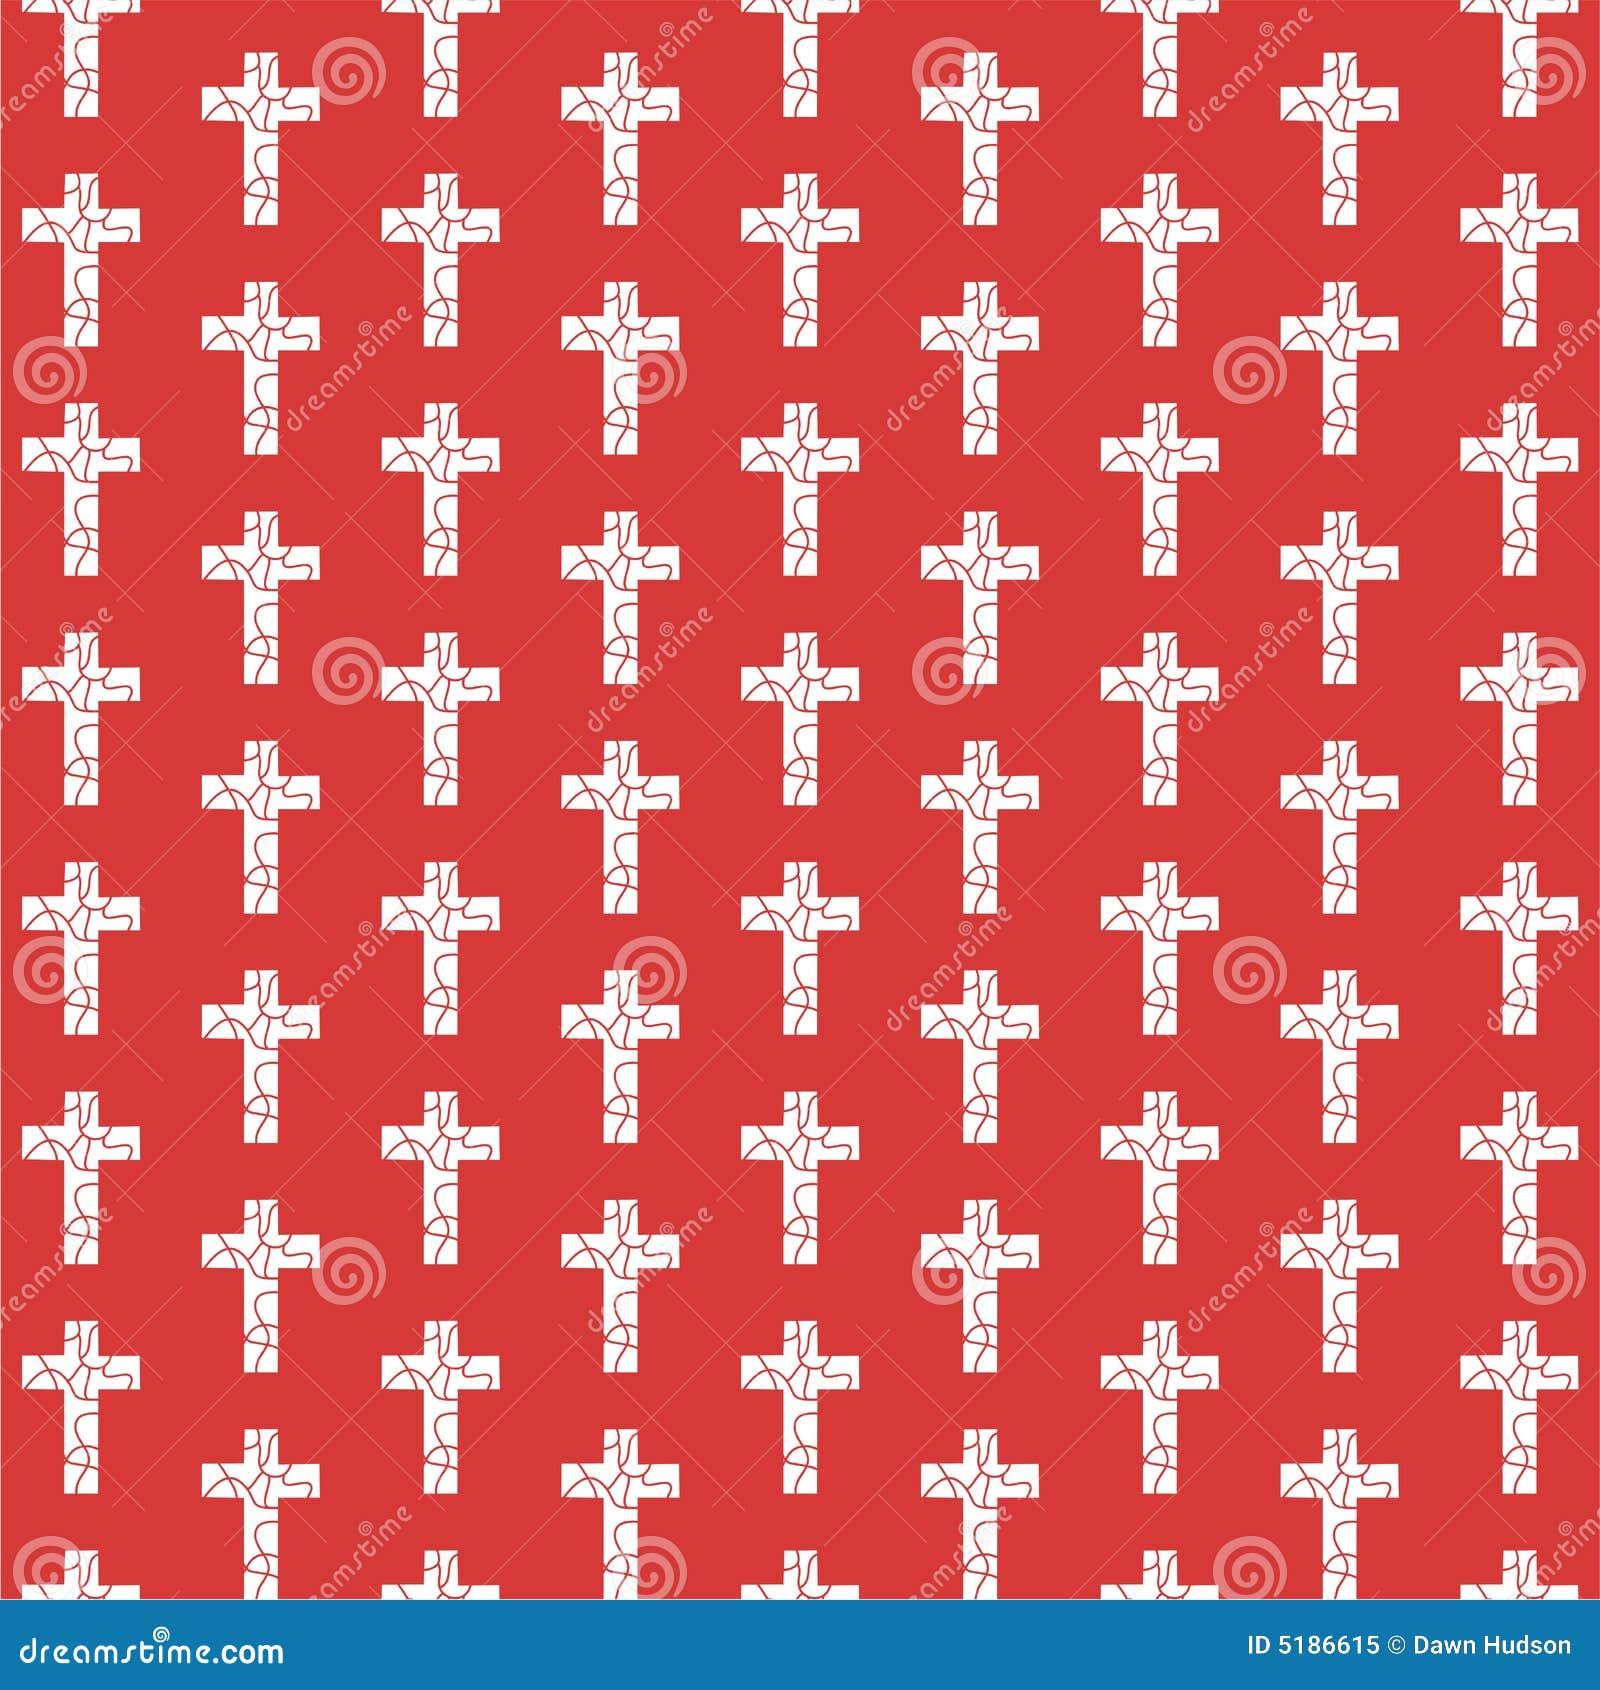 cross wallpaper royalty free stock photo image 5186615